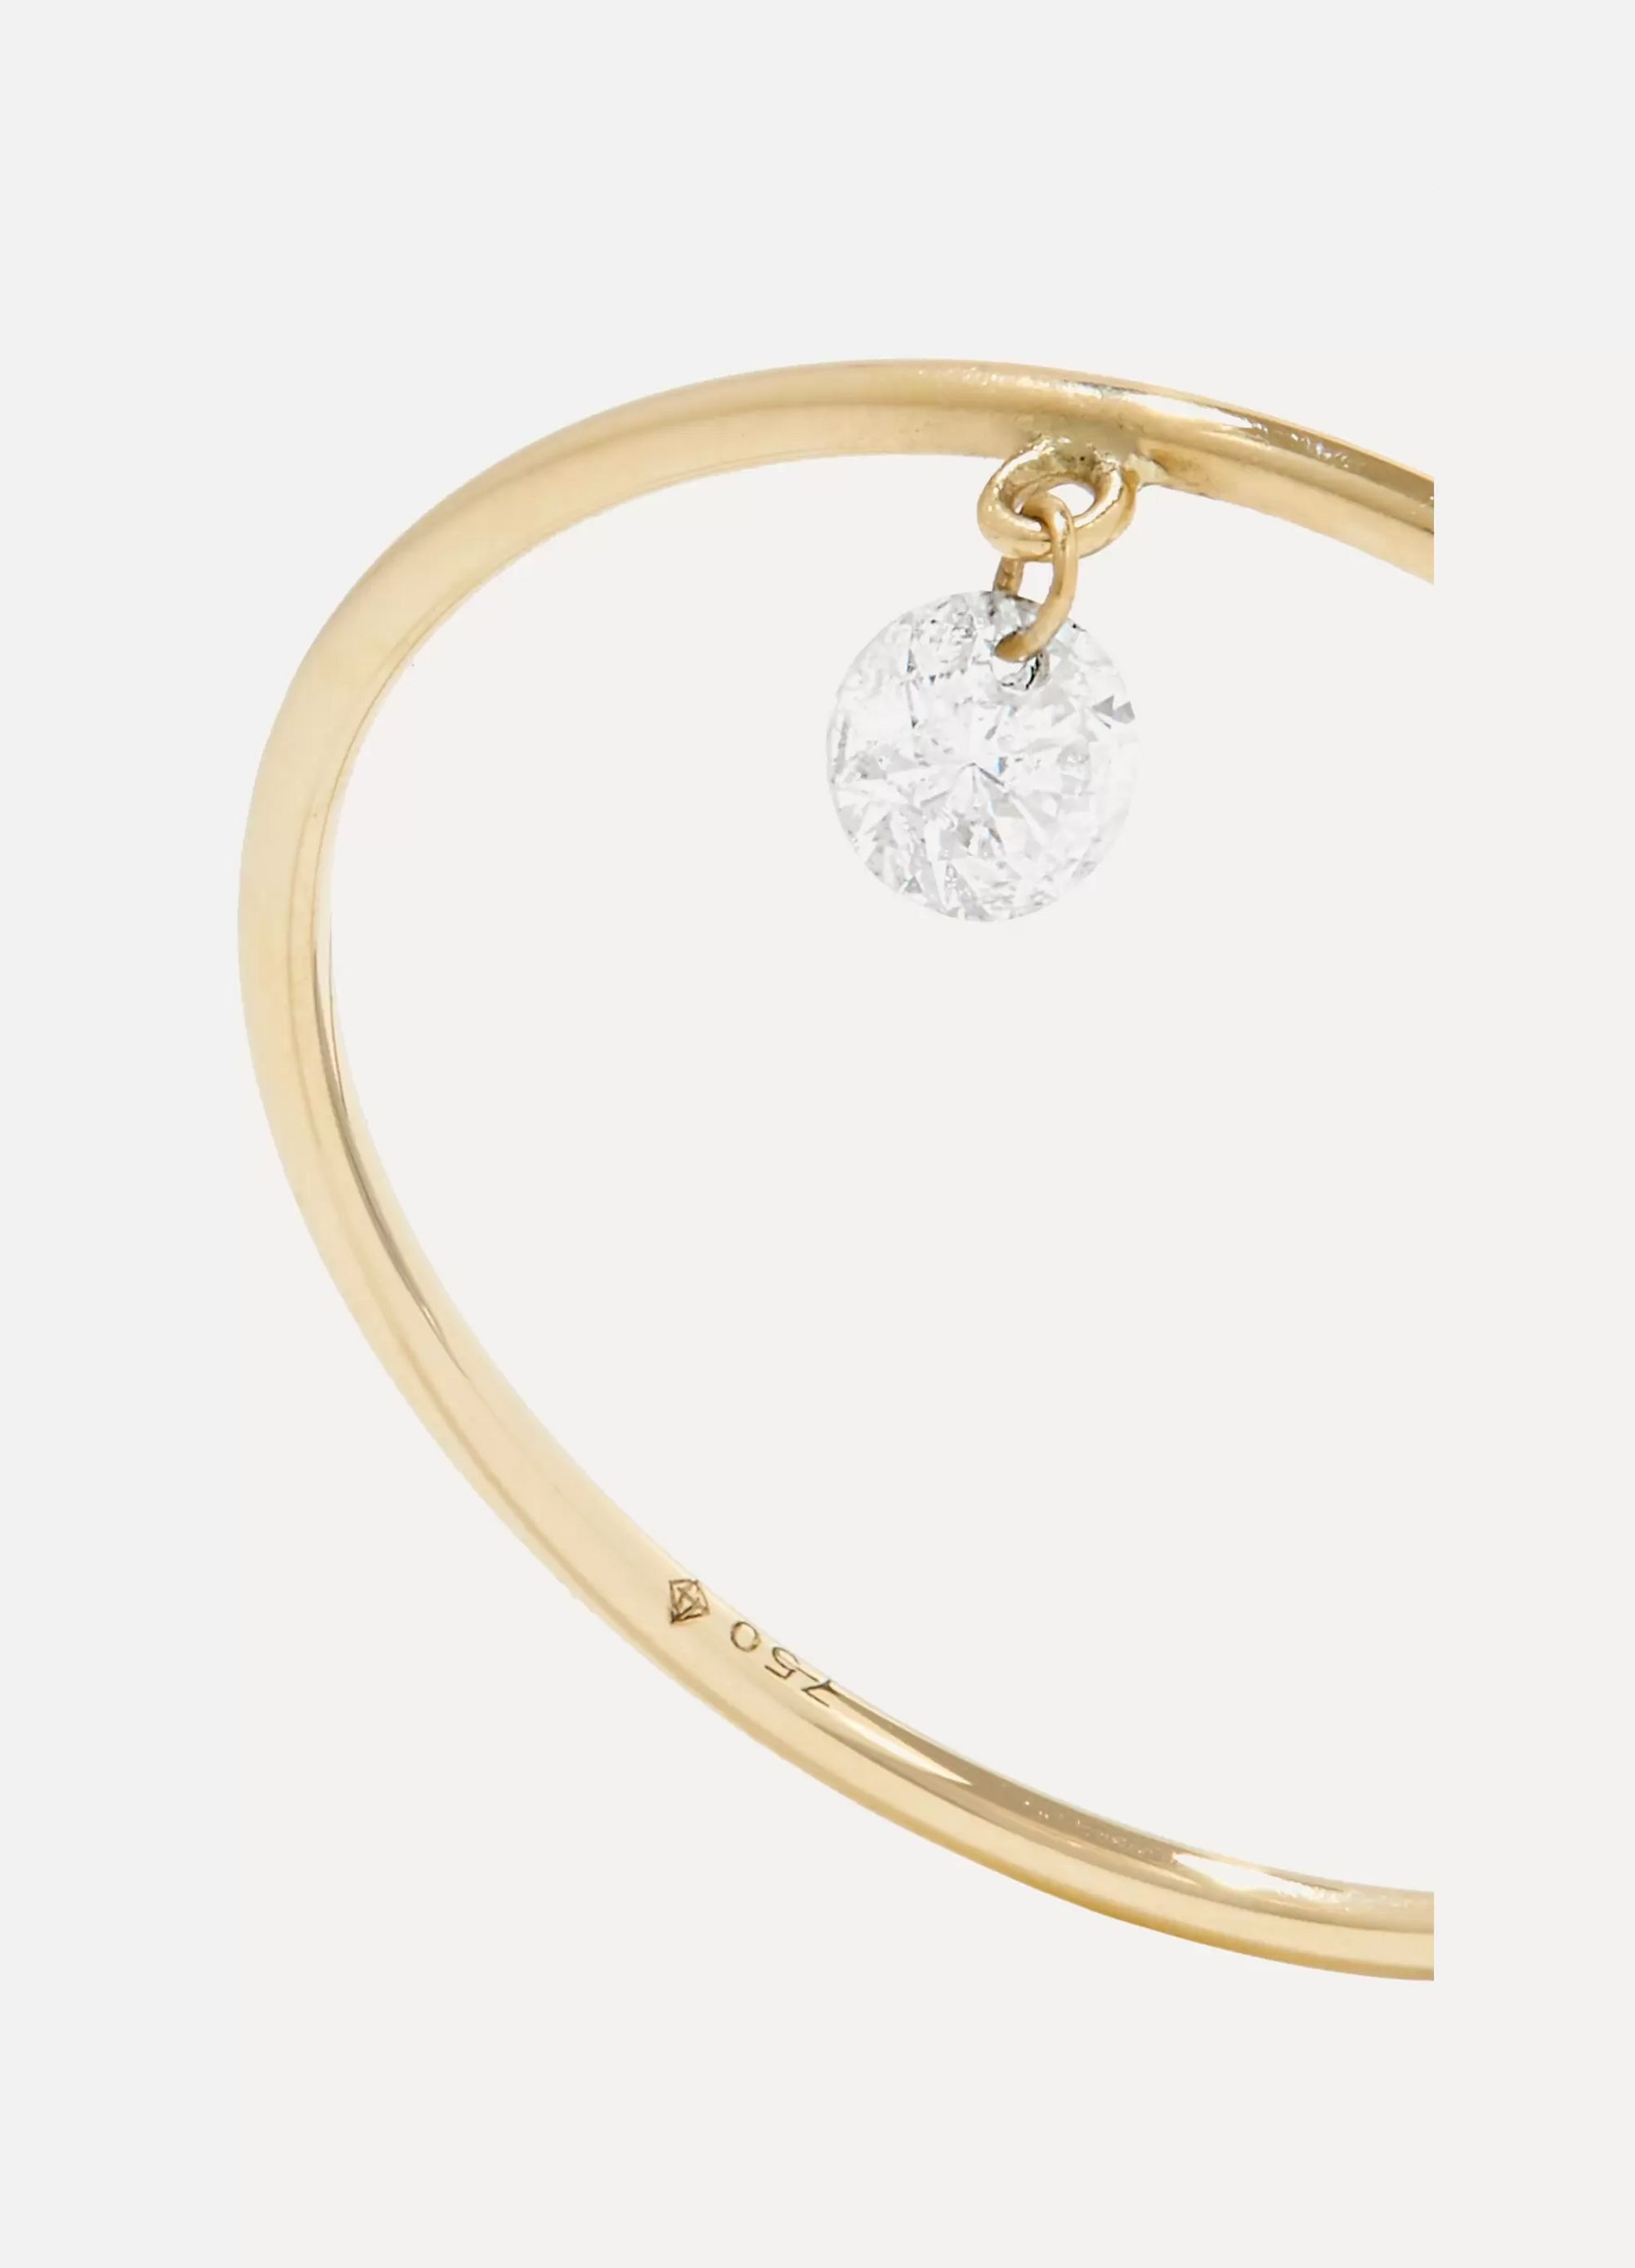 Persée Danae gold diamond ring